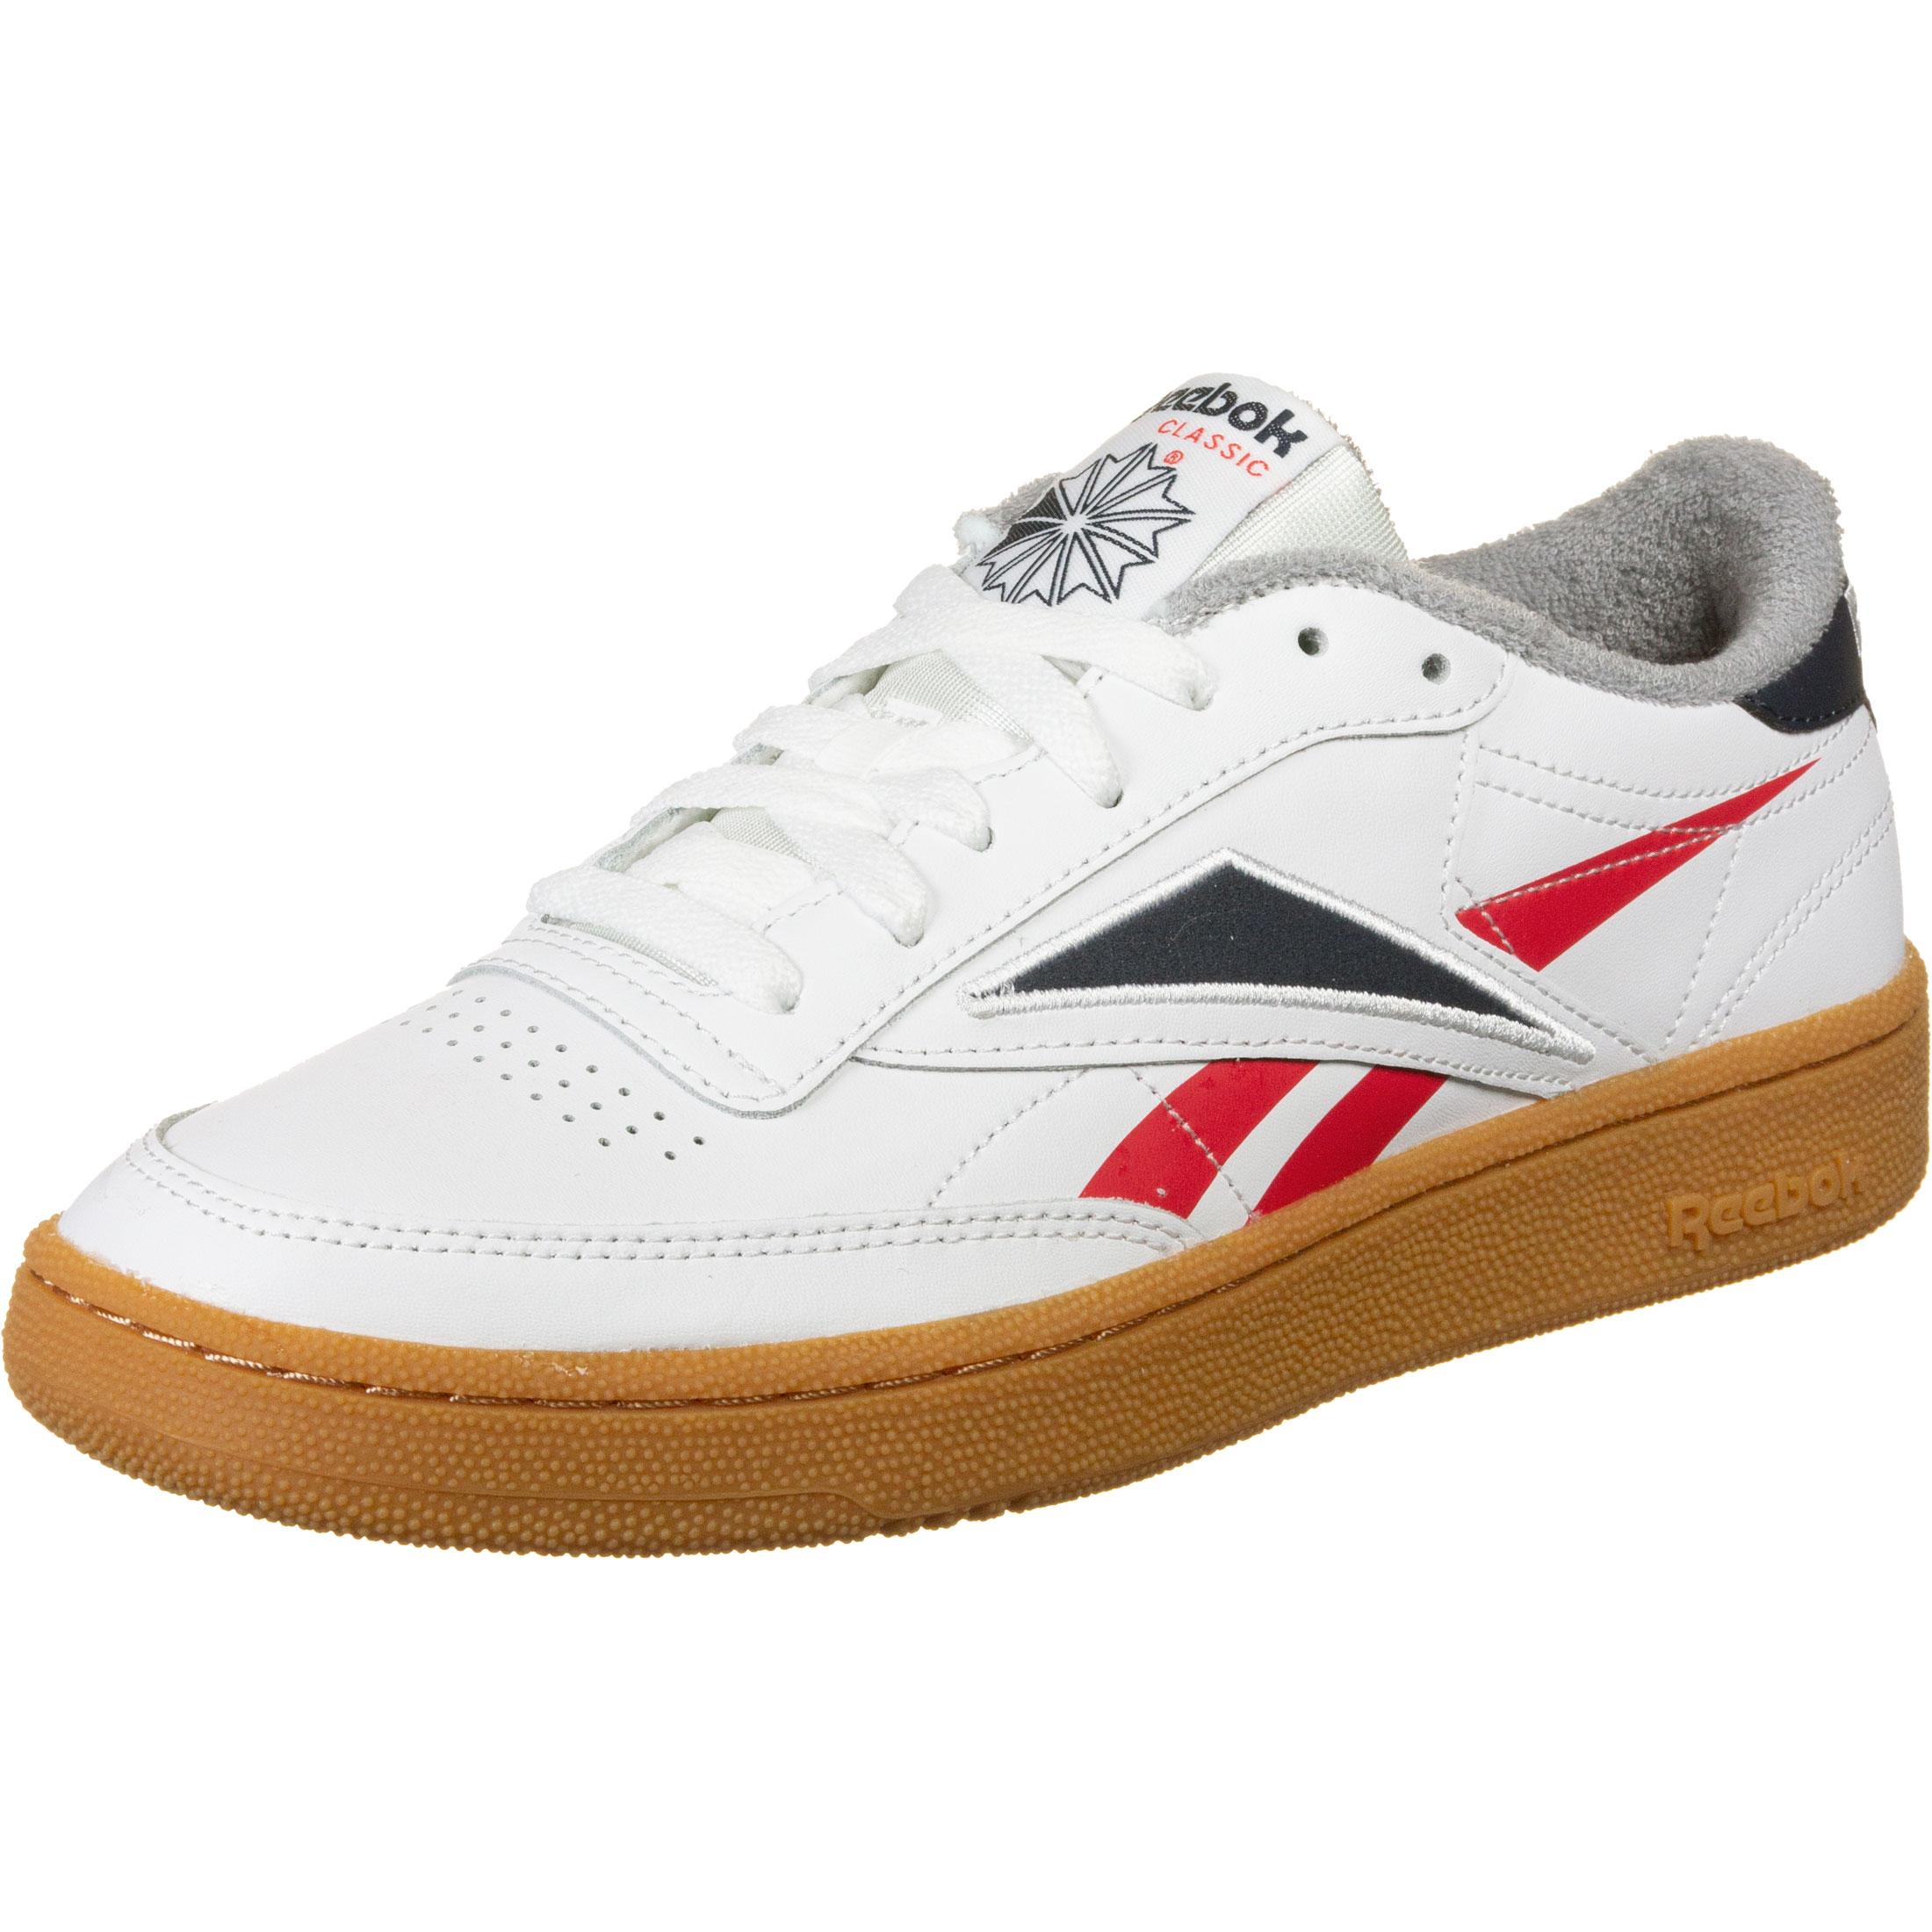 Reebok Club C 85 MU - Sneakers Low at